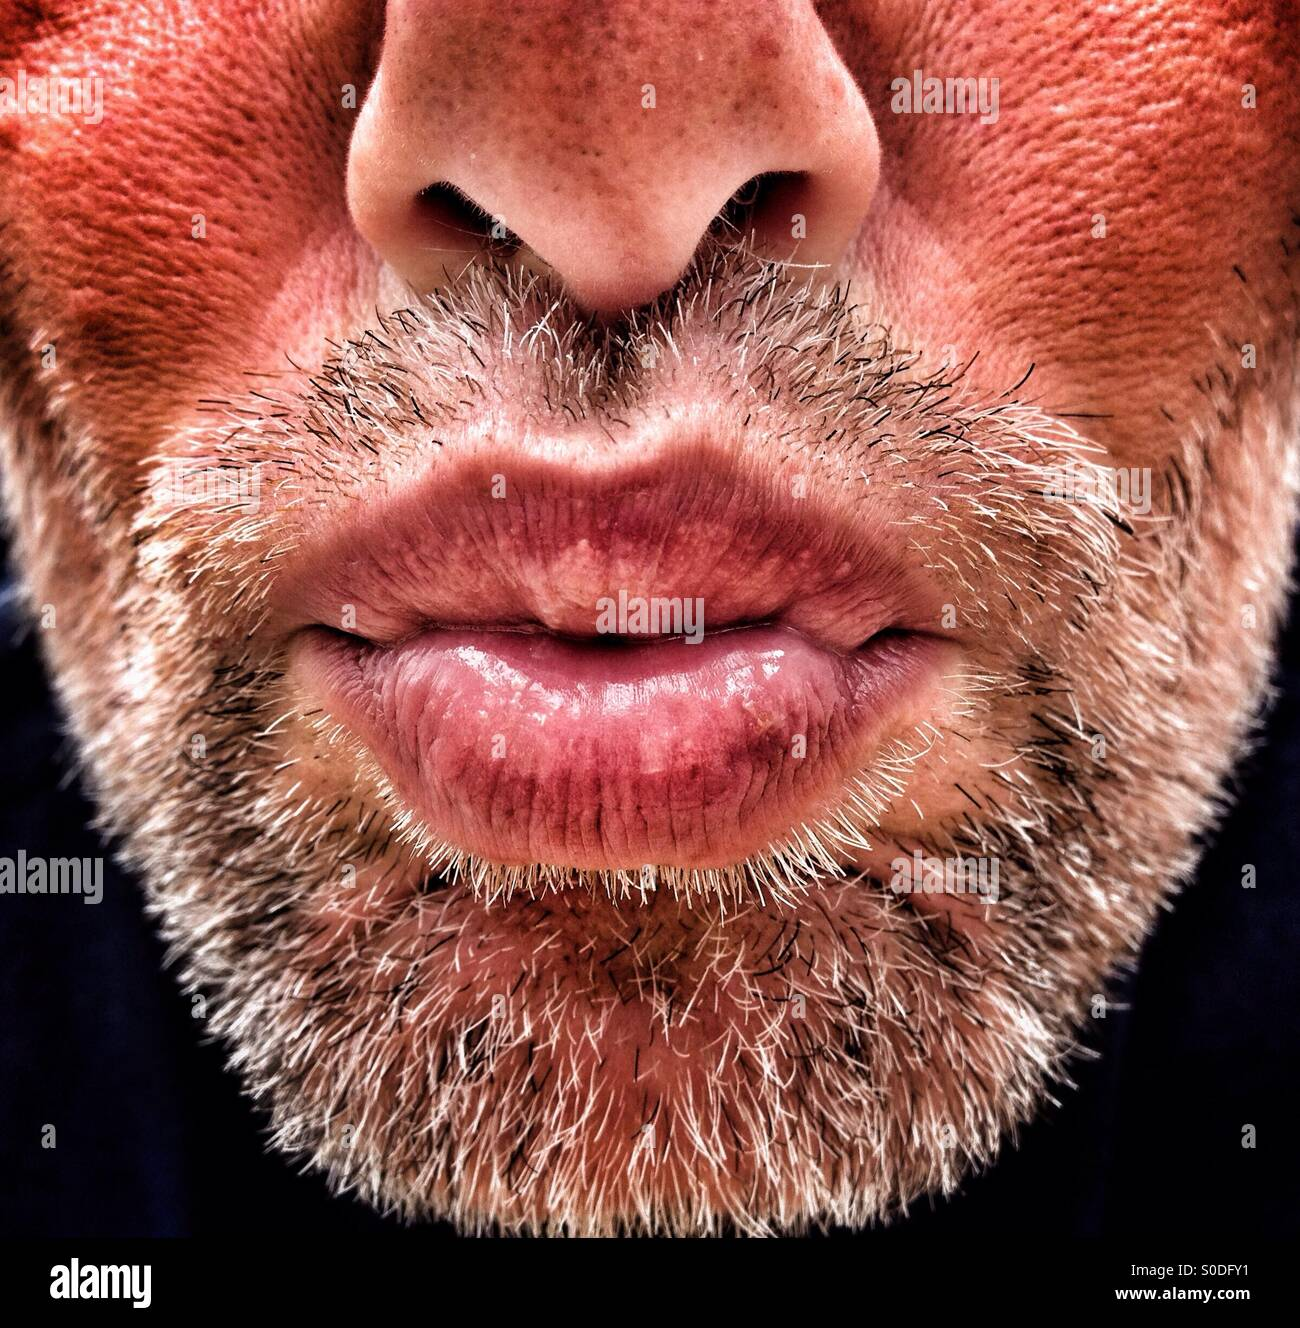 Mâle adulte avec soufflage barbe kiss Photo Stock